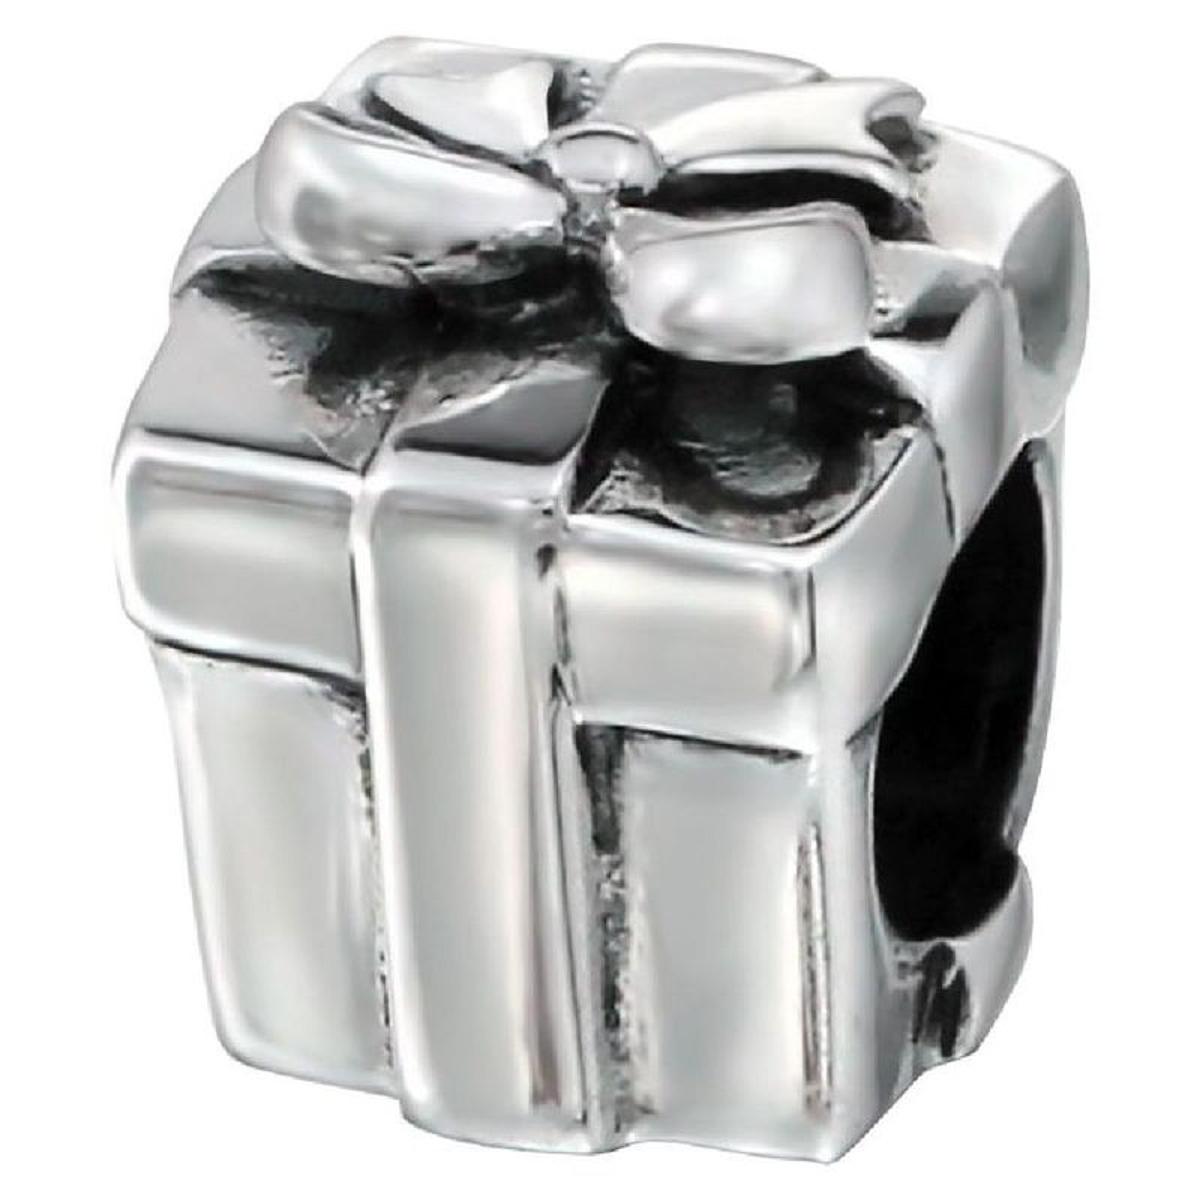 Charm Paquet Cadeau Noeud Ruban - Charms Compatibles Pandora, Trollbeads, Chamilia, Biagi - Argent 925